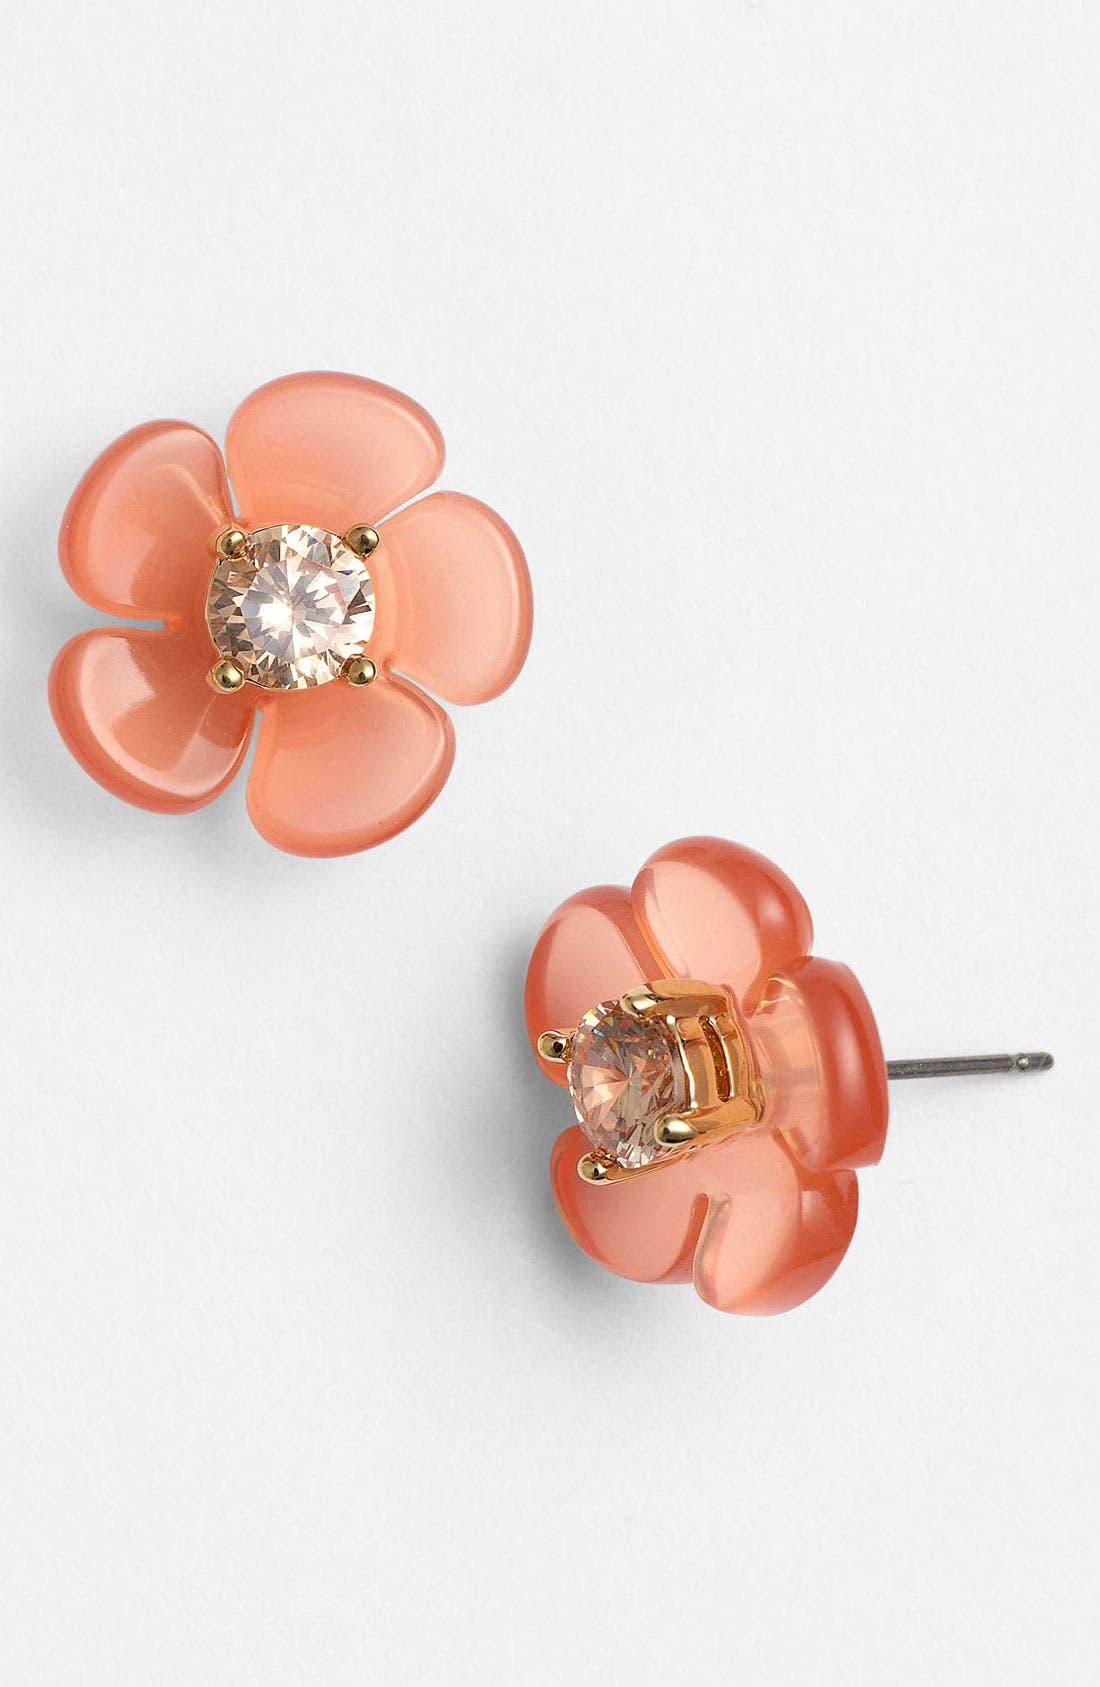 Main Image - Tory Burch 'Flora' Stud Earrings